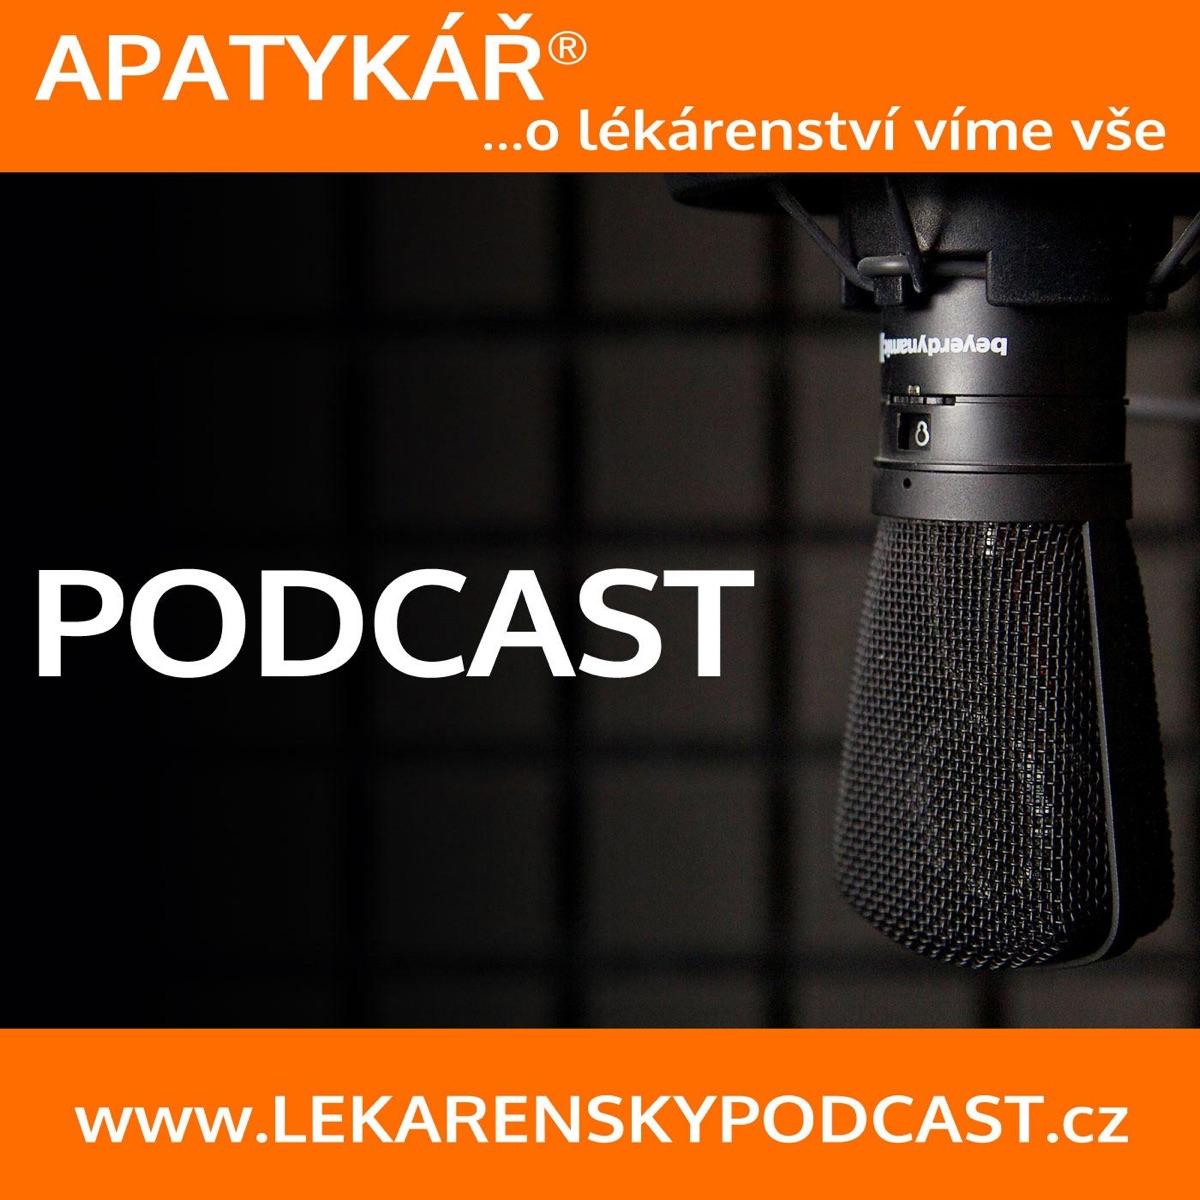 APATYKÁŘ® – Podcast